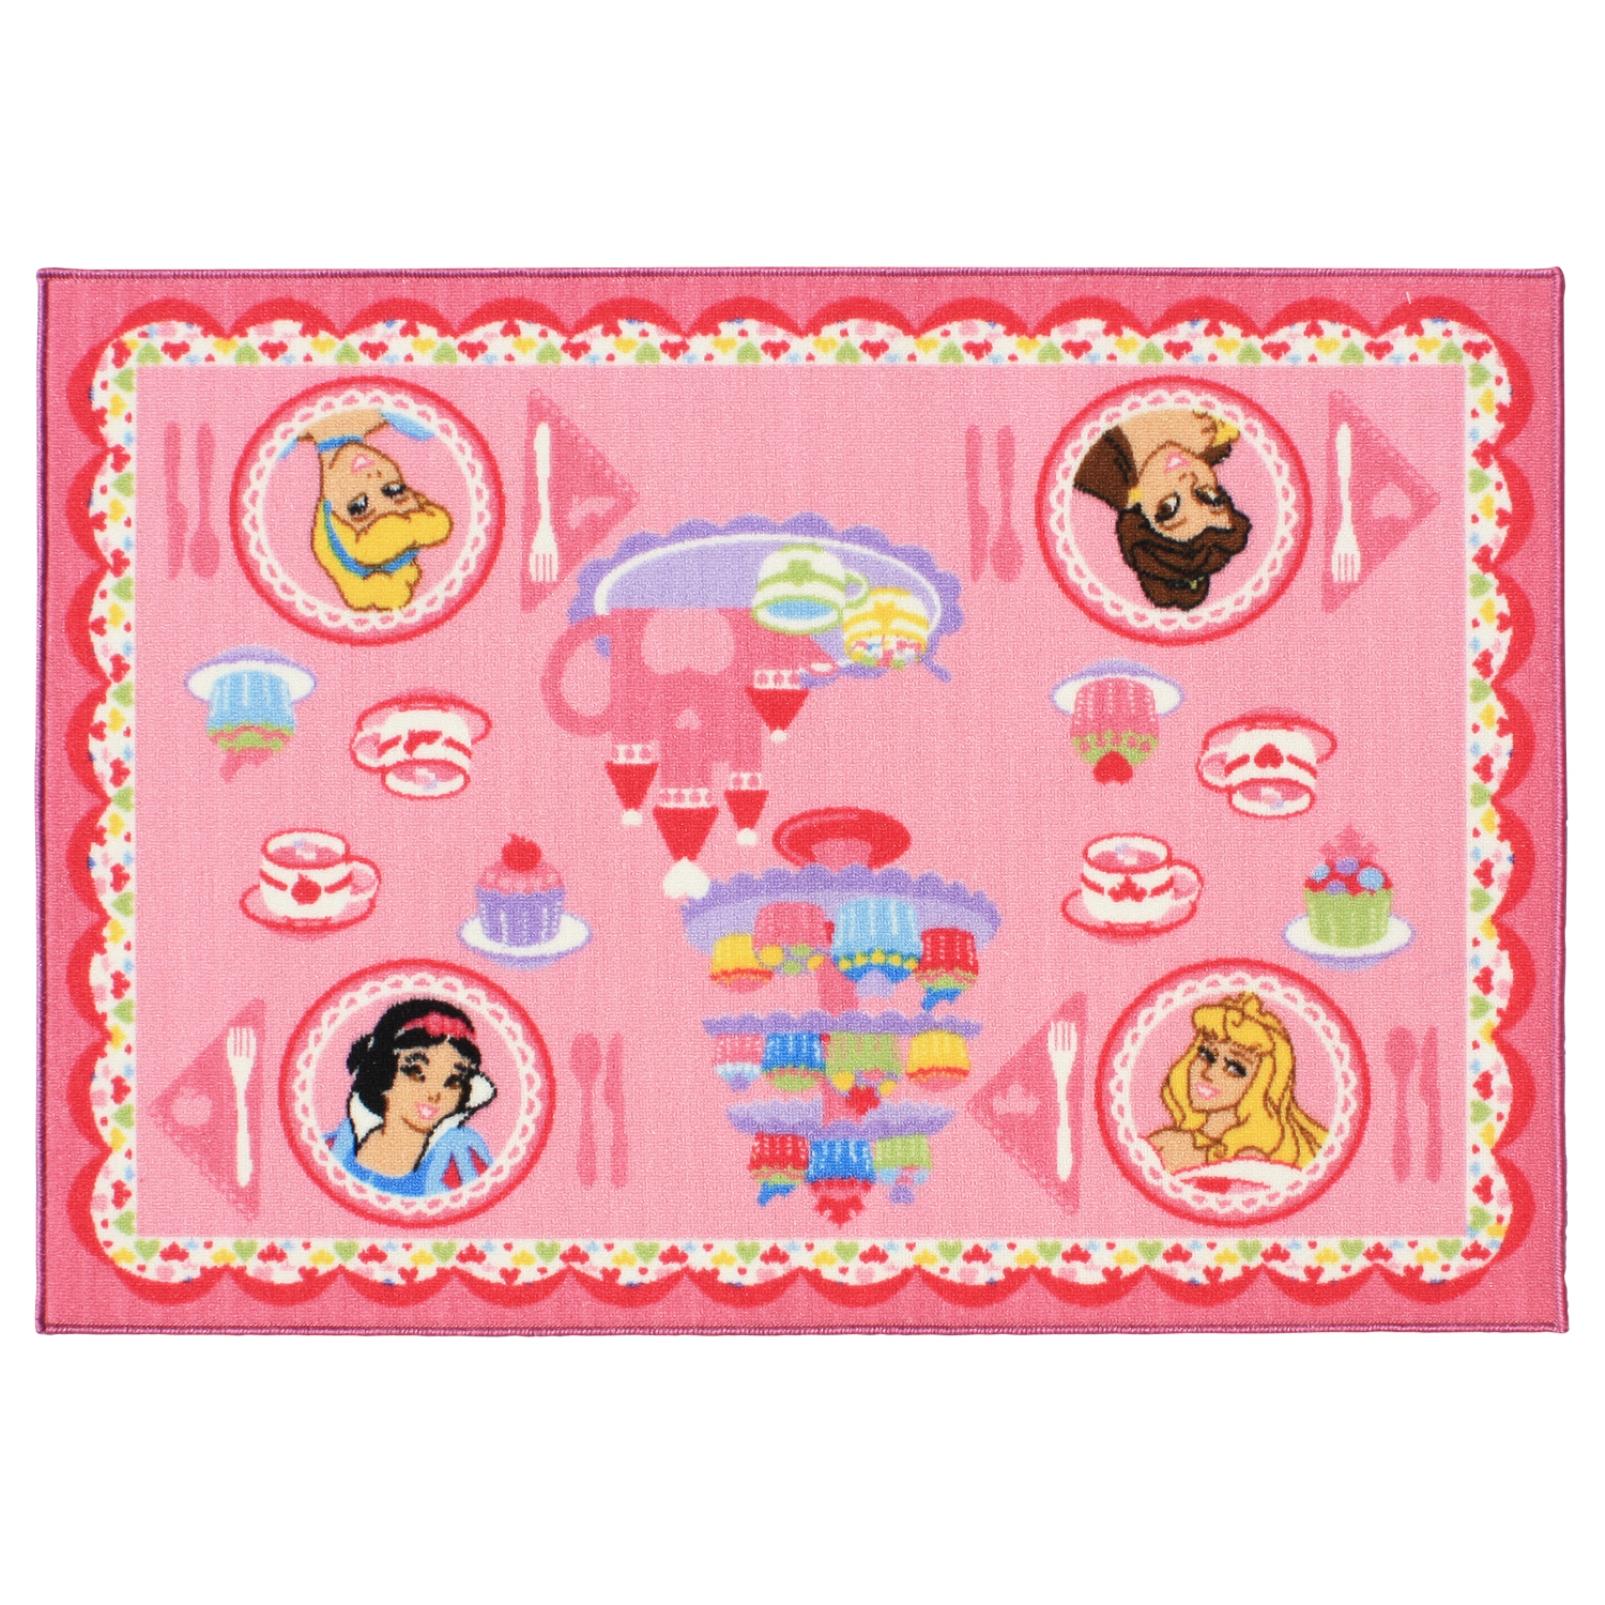 Disney Princess Tea Party Interactive Game Rug